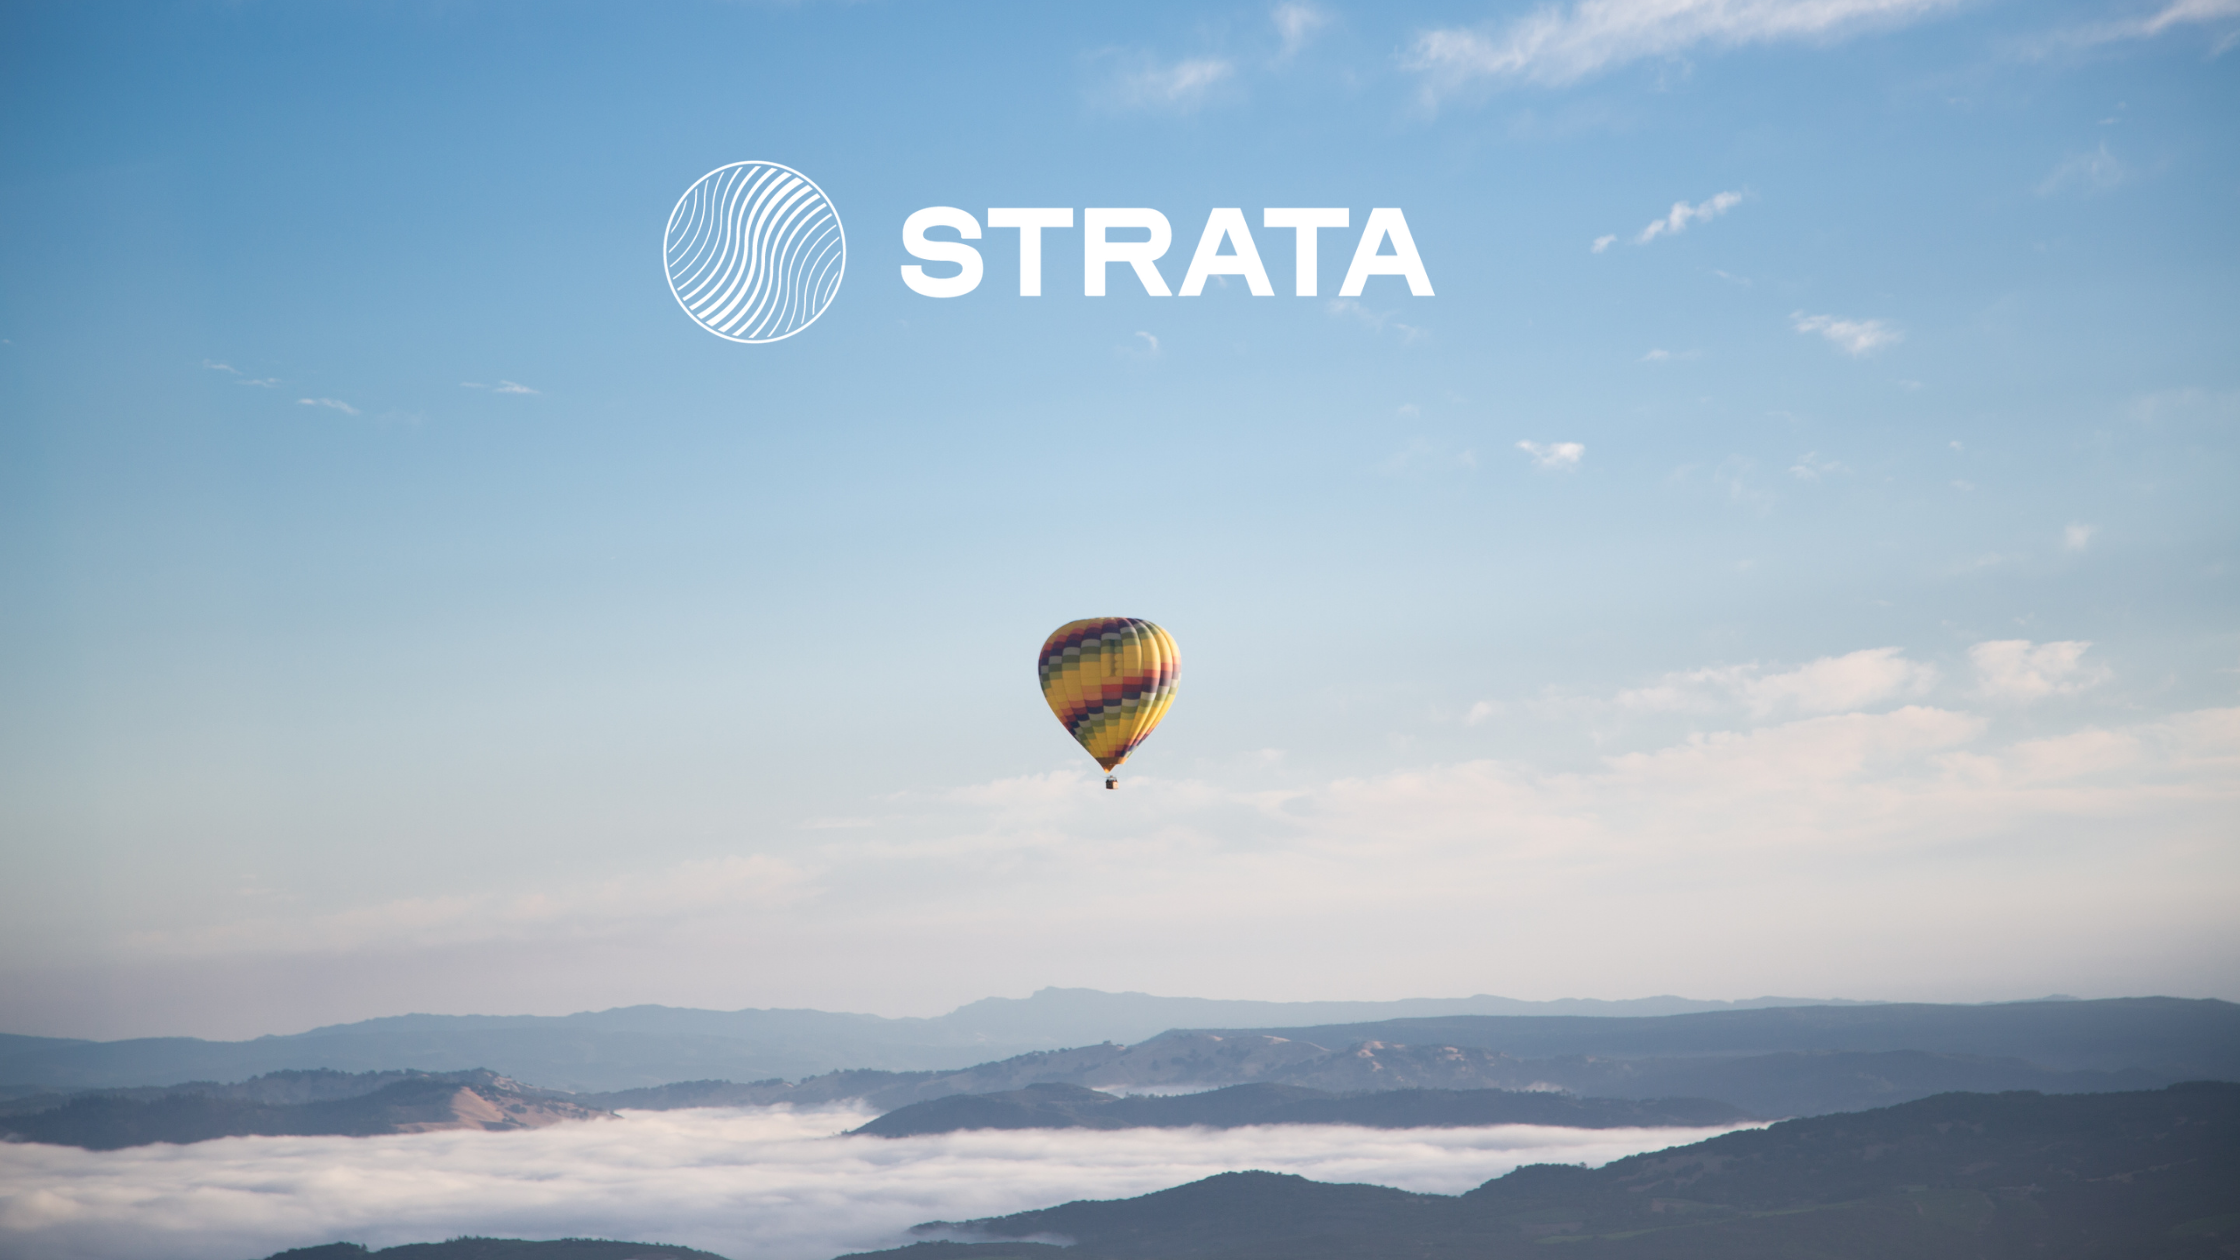 image of Hot Air Balloon - Strata.io